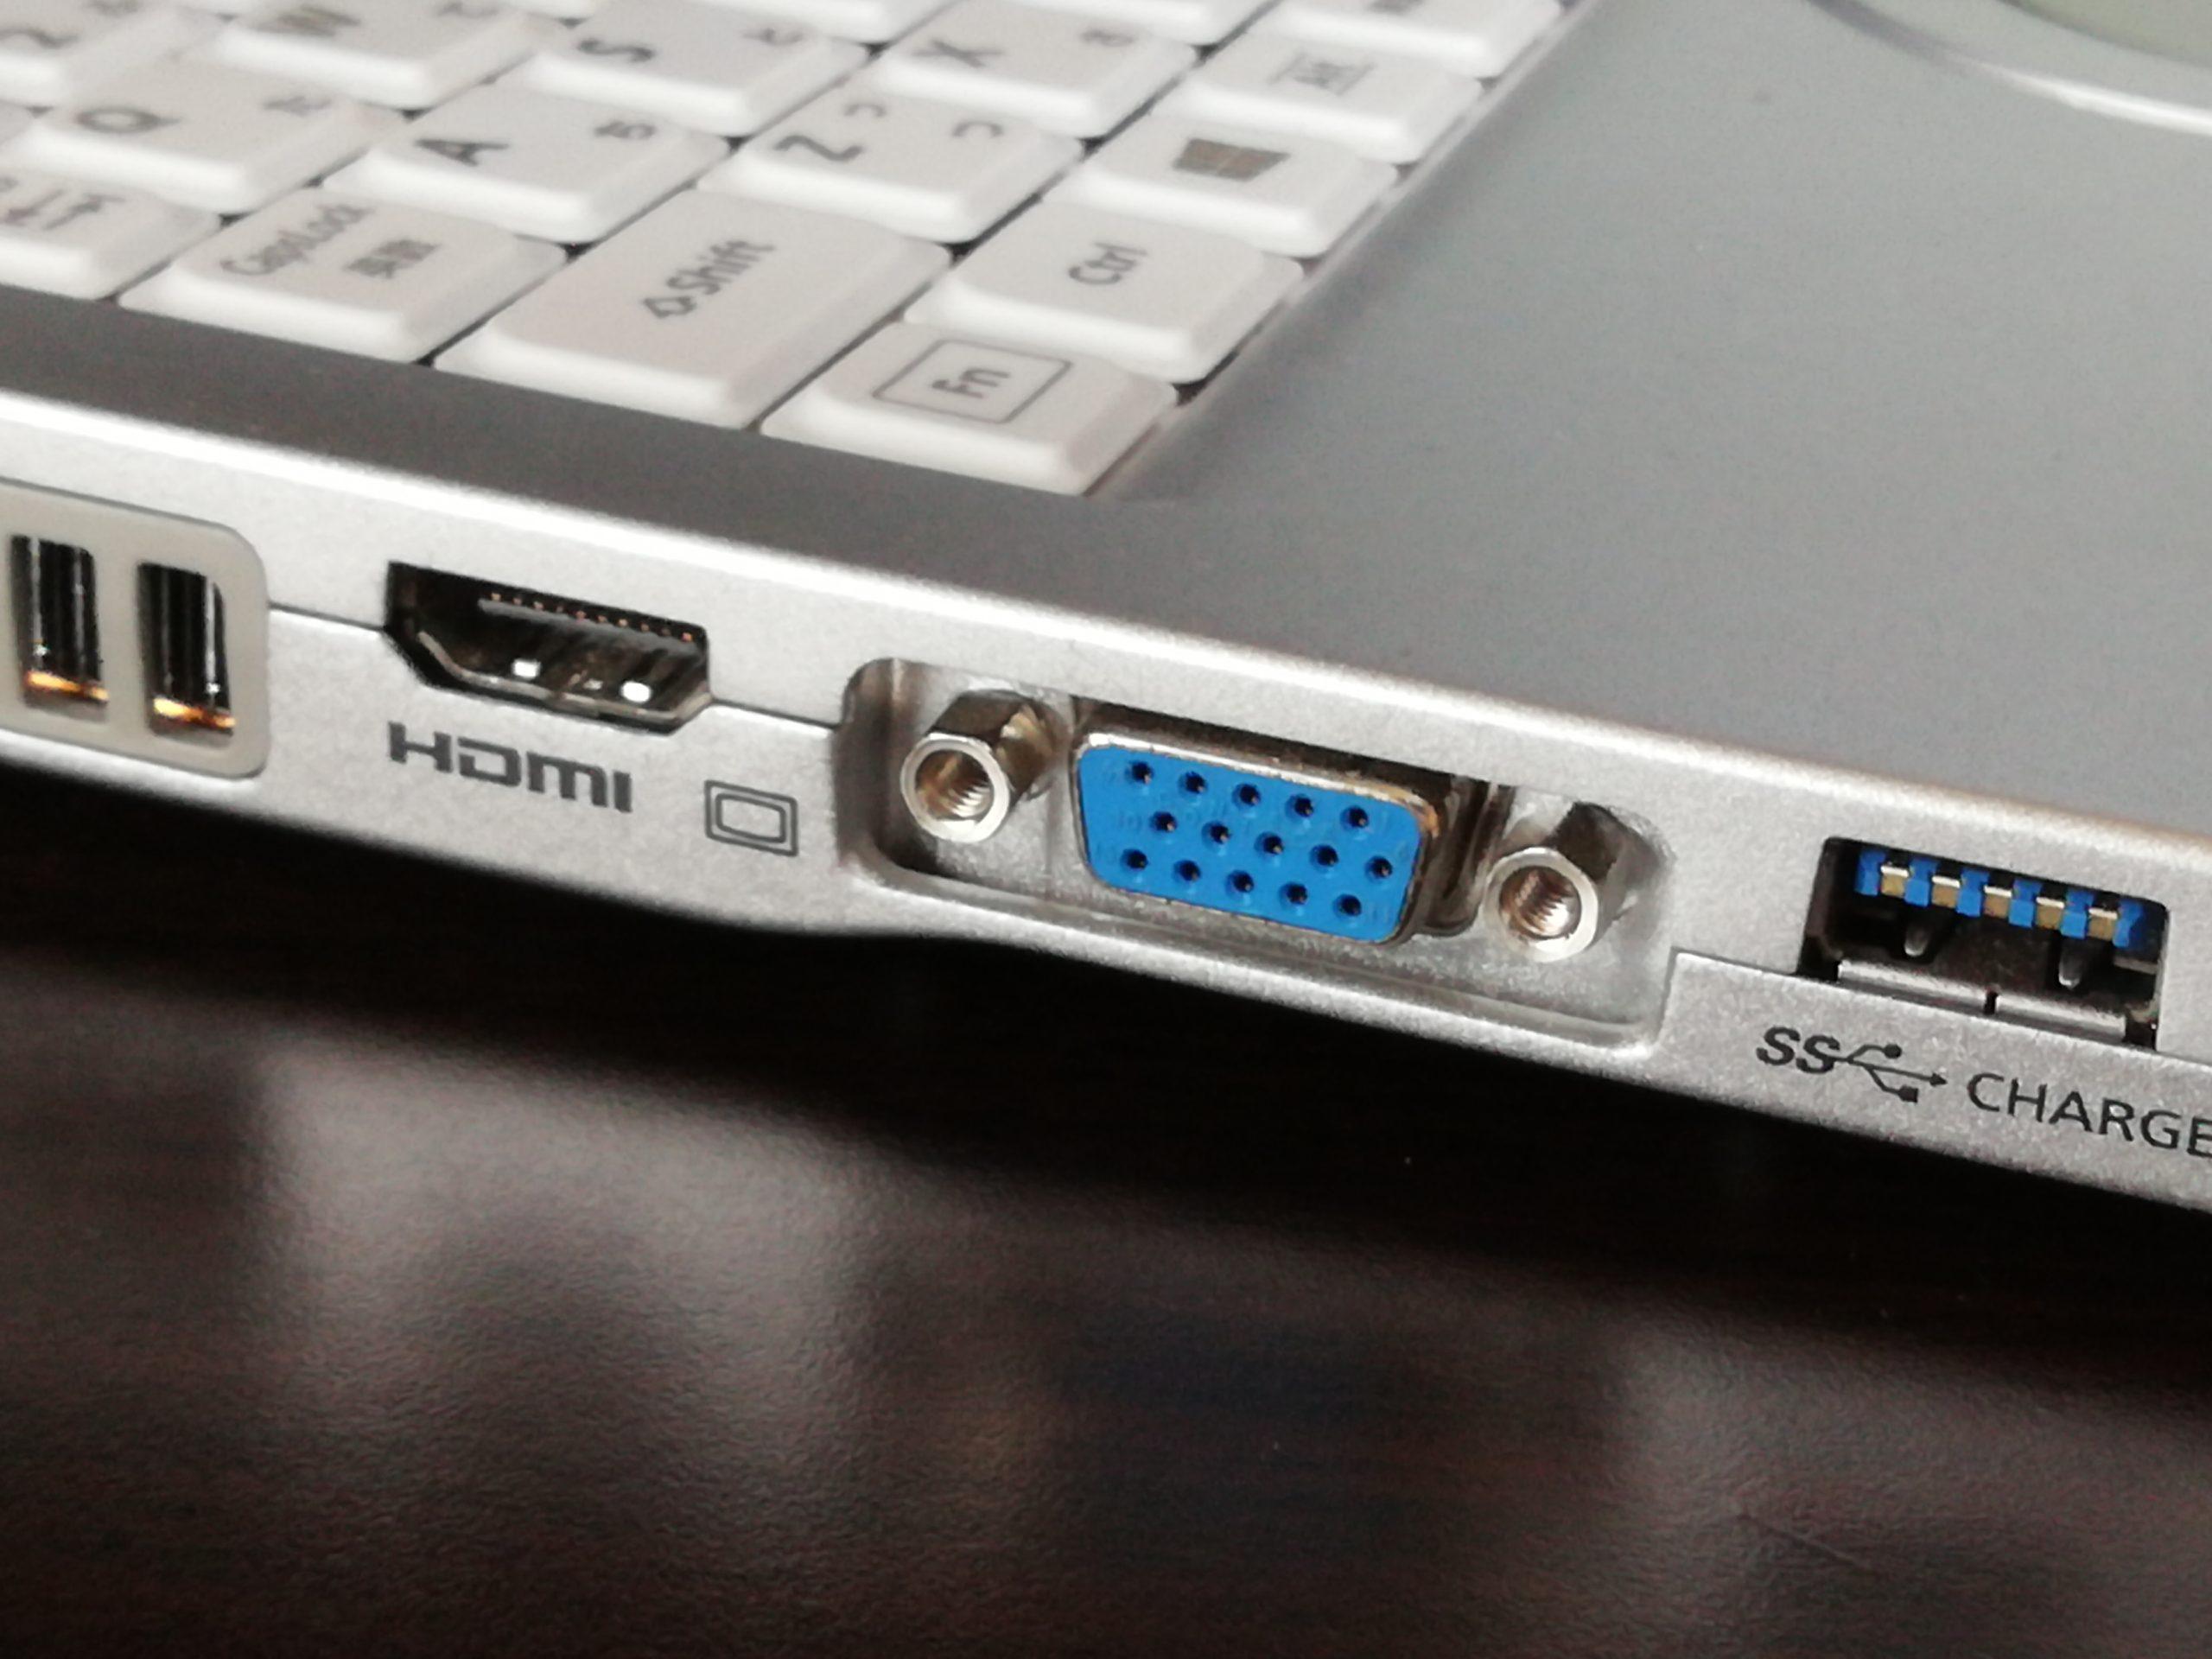 VGA端子とHDMI端子のパソコン